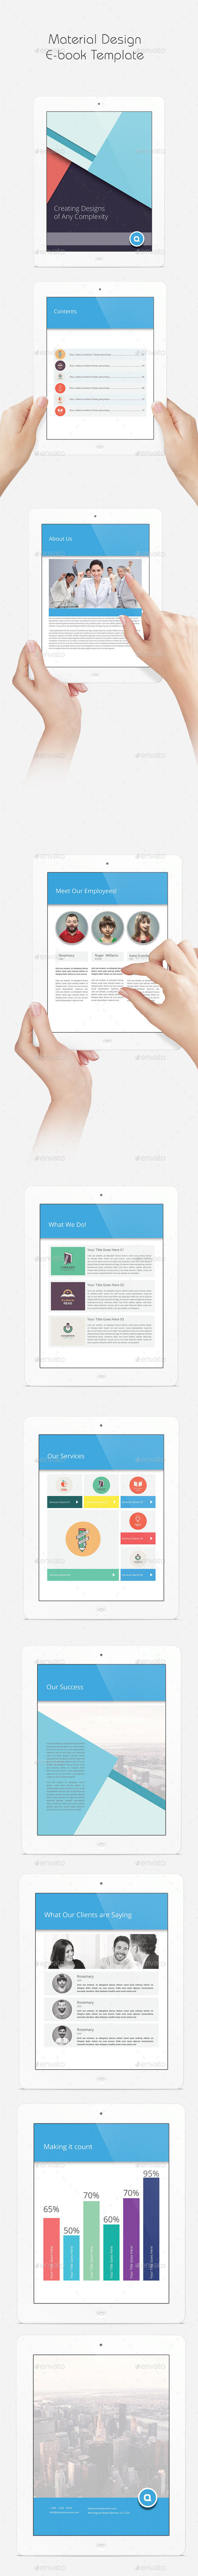 Material Design eBook Template - ePublishing